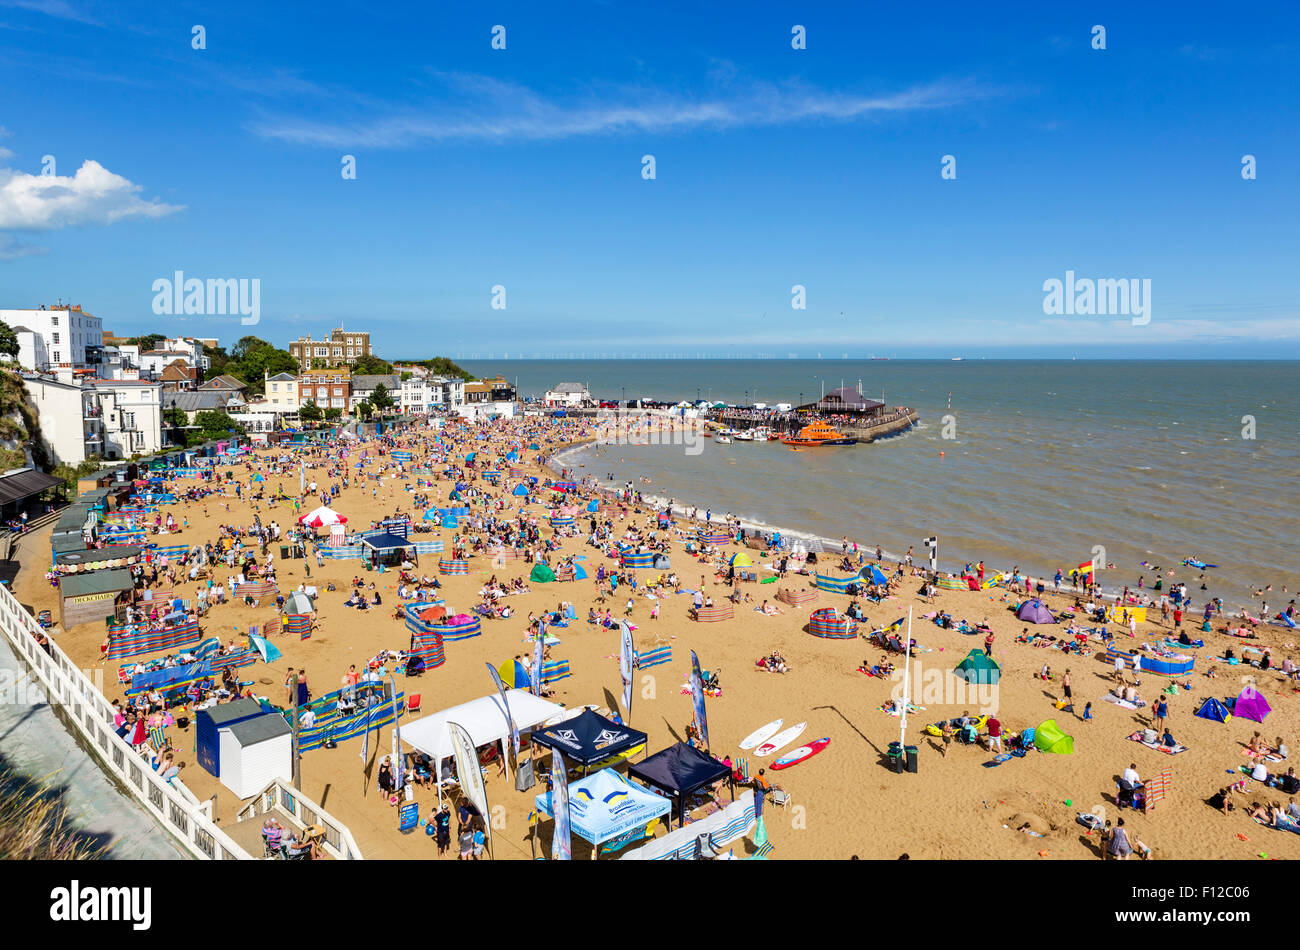 La playa en Broadstairs, Kent, Inglaterra, Reino Unido. Imagen De Stock